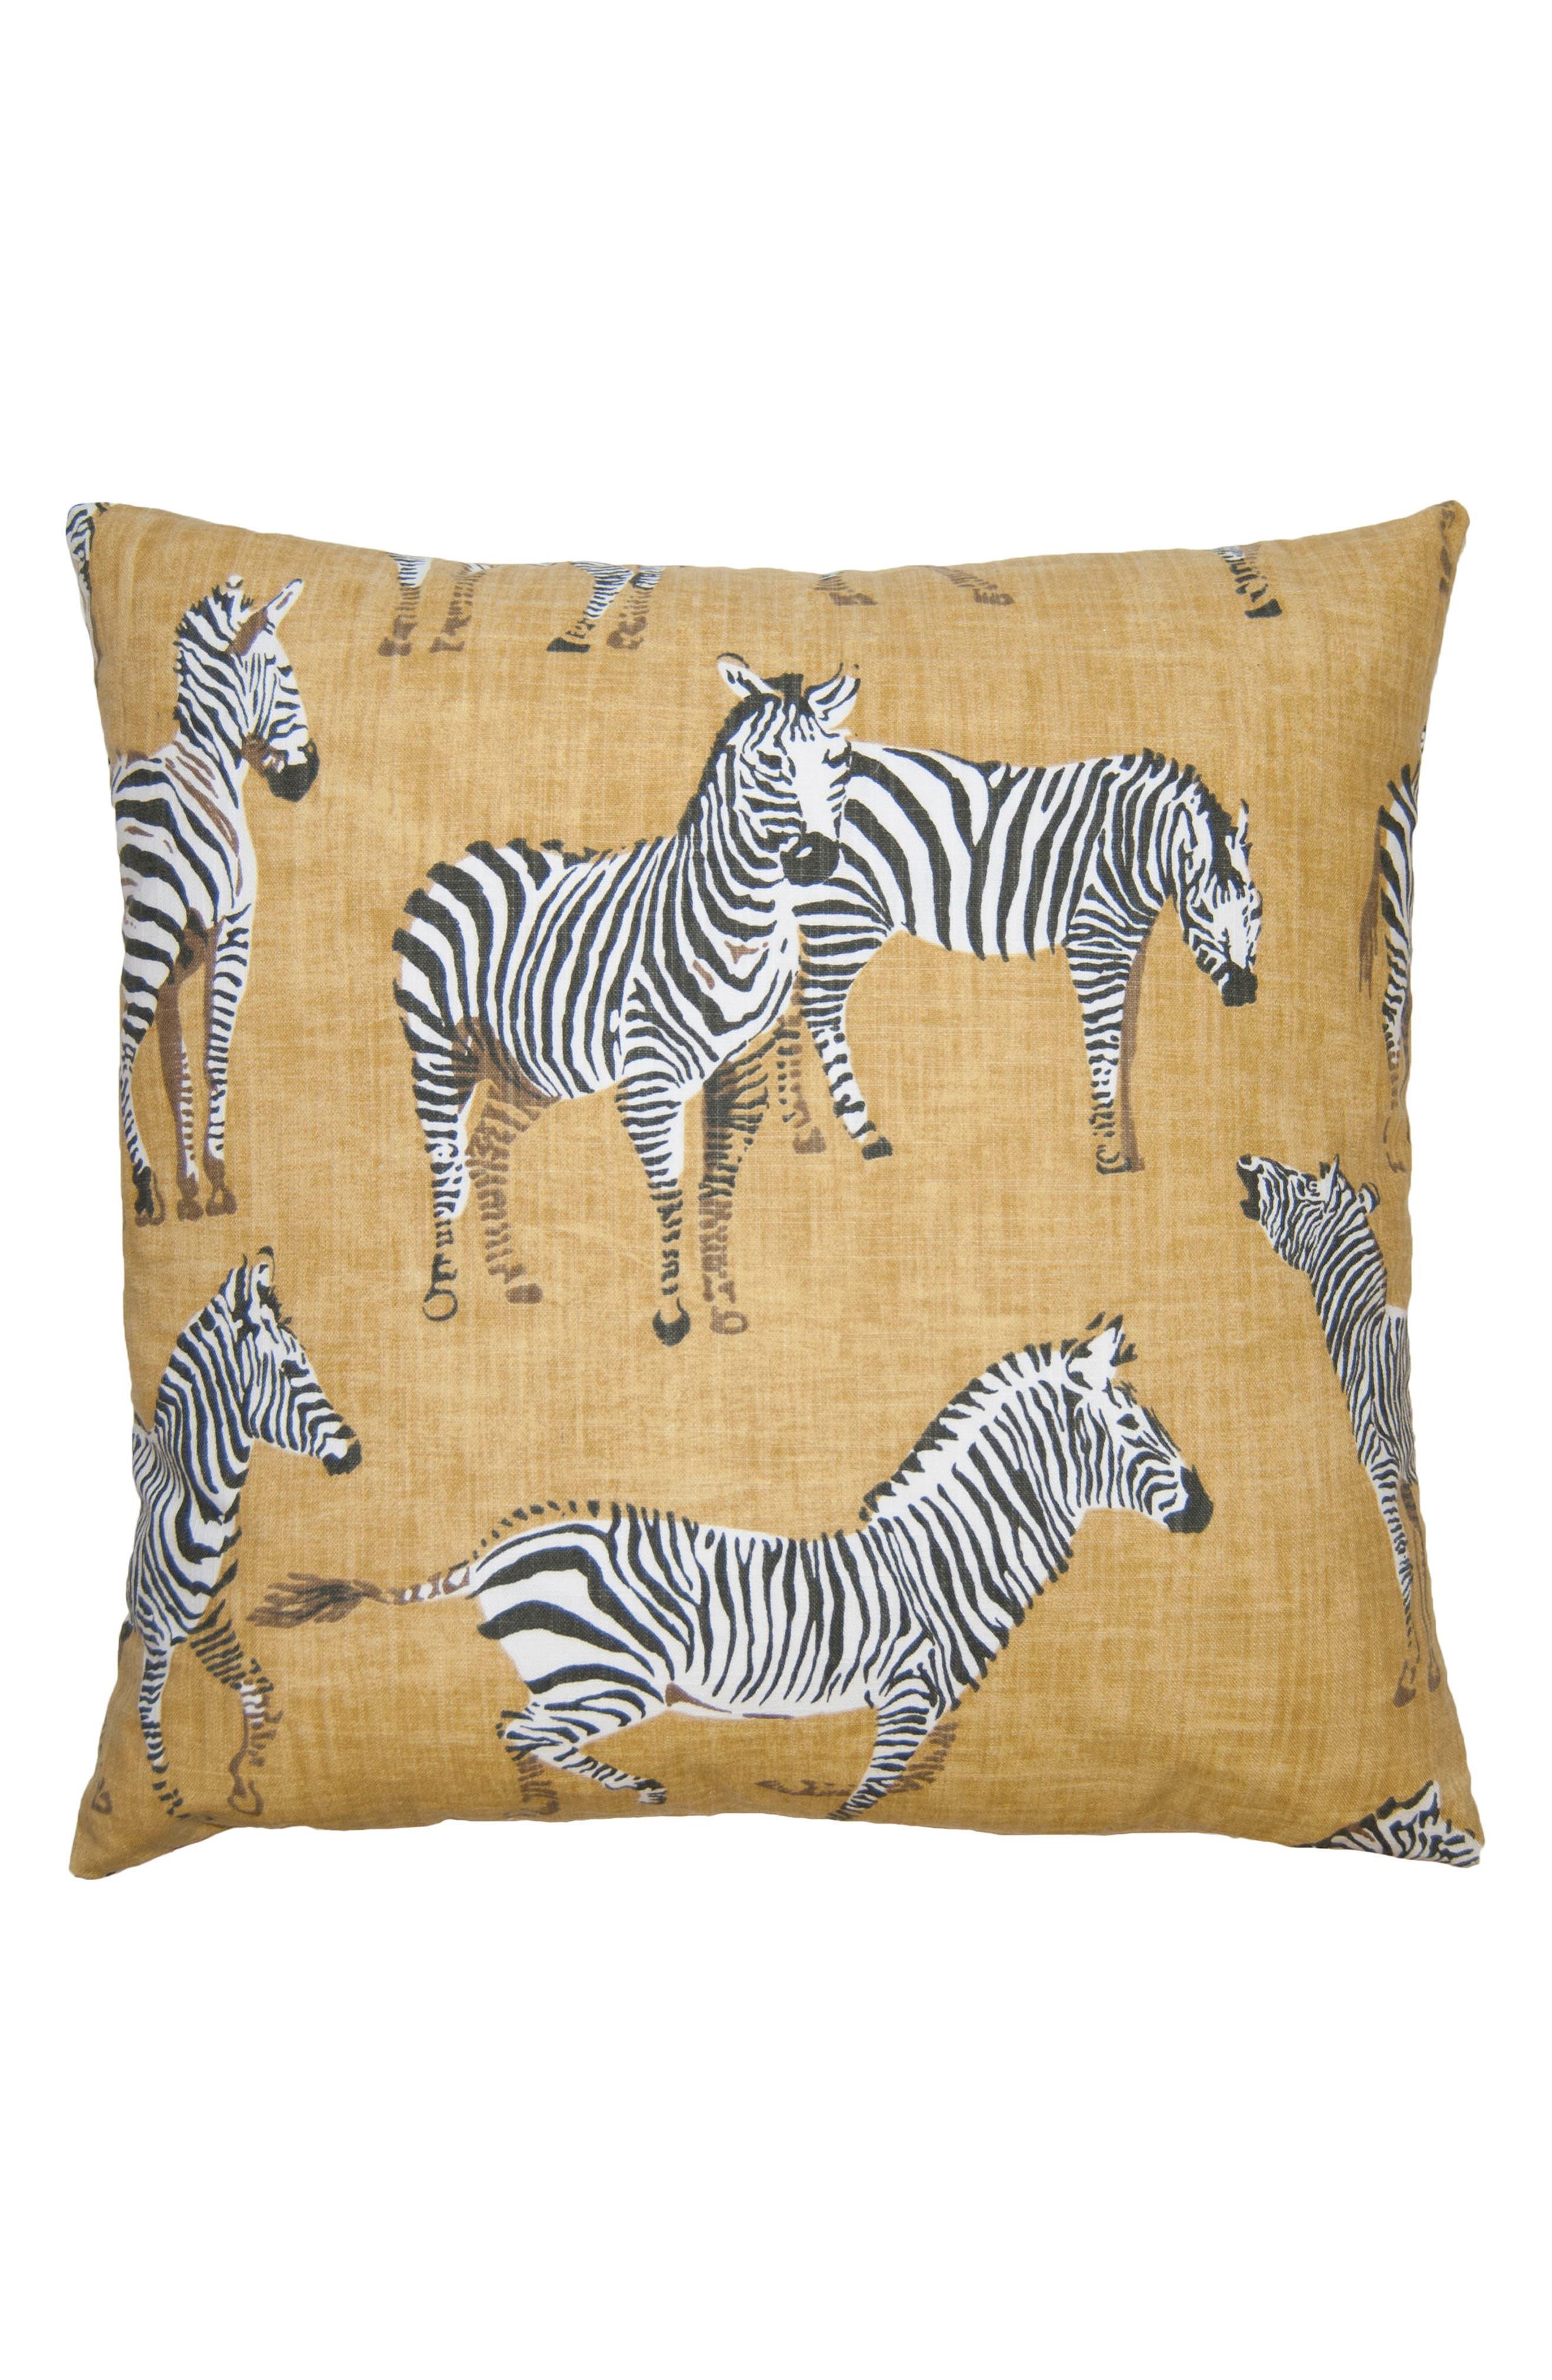 Kingdom Zebra Accent Pillow,                         Main,                         color, Tan